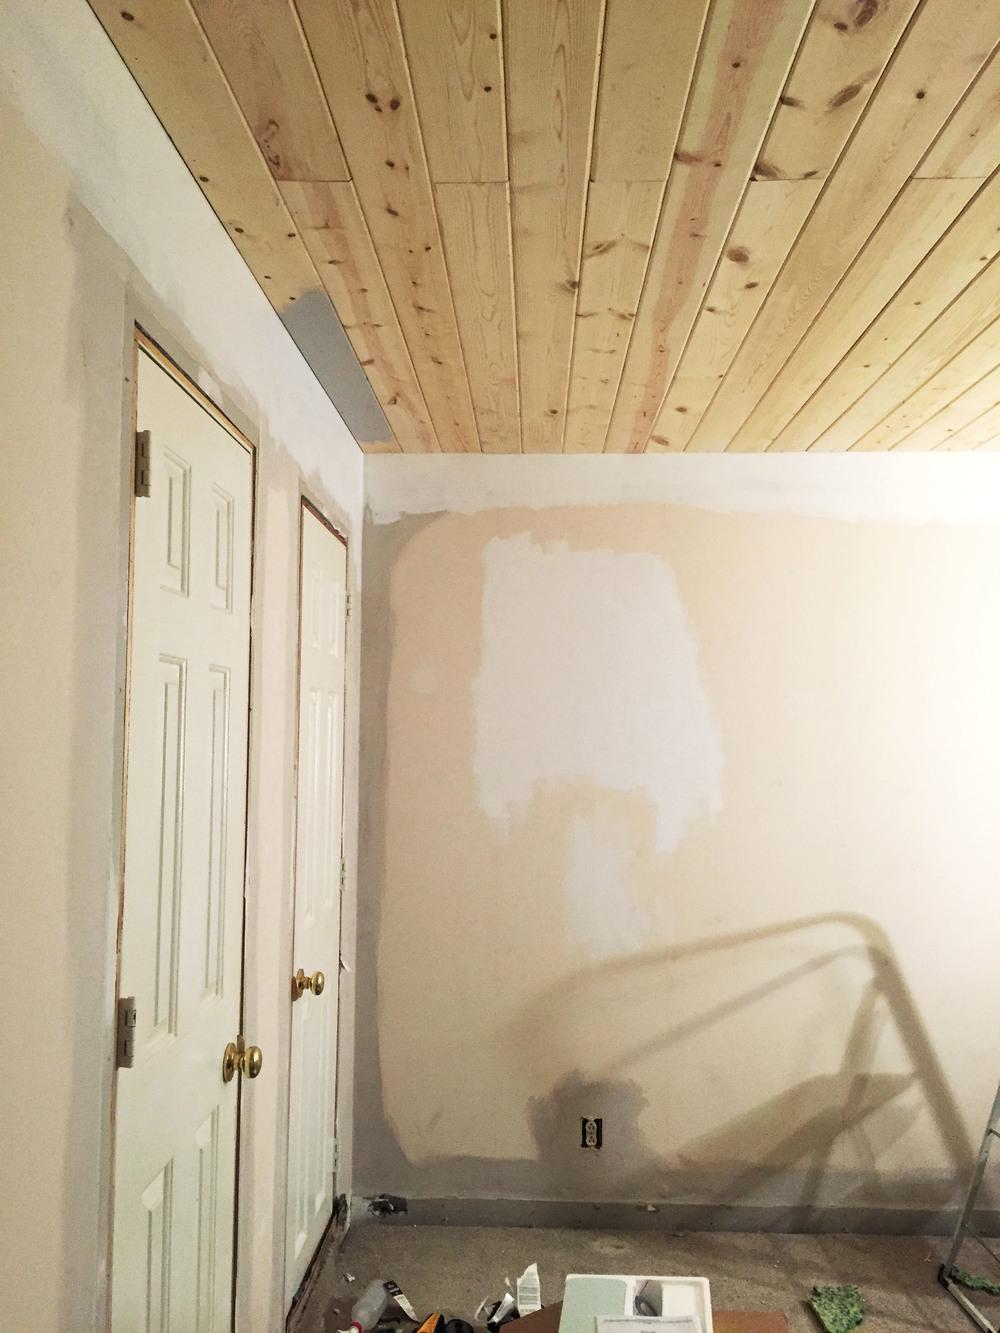 amanda totoro design : wood plank ceiling